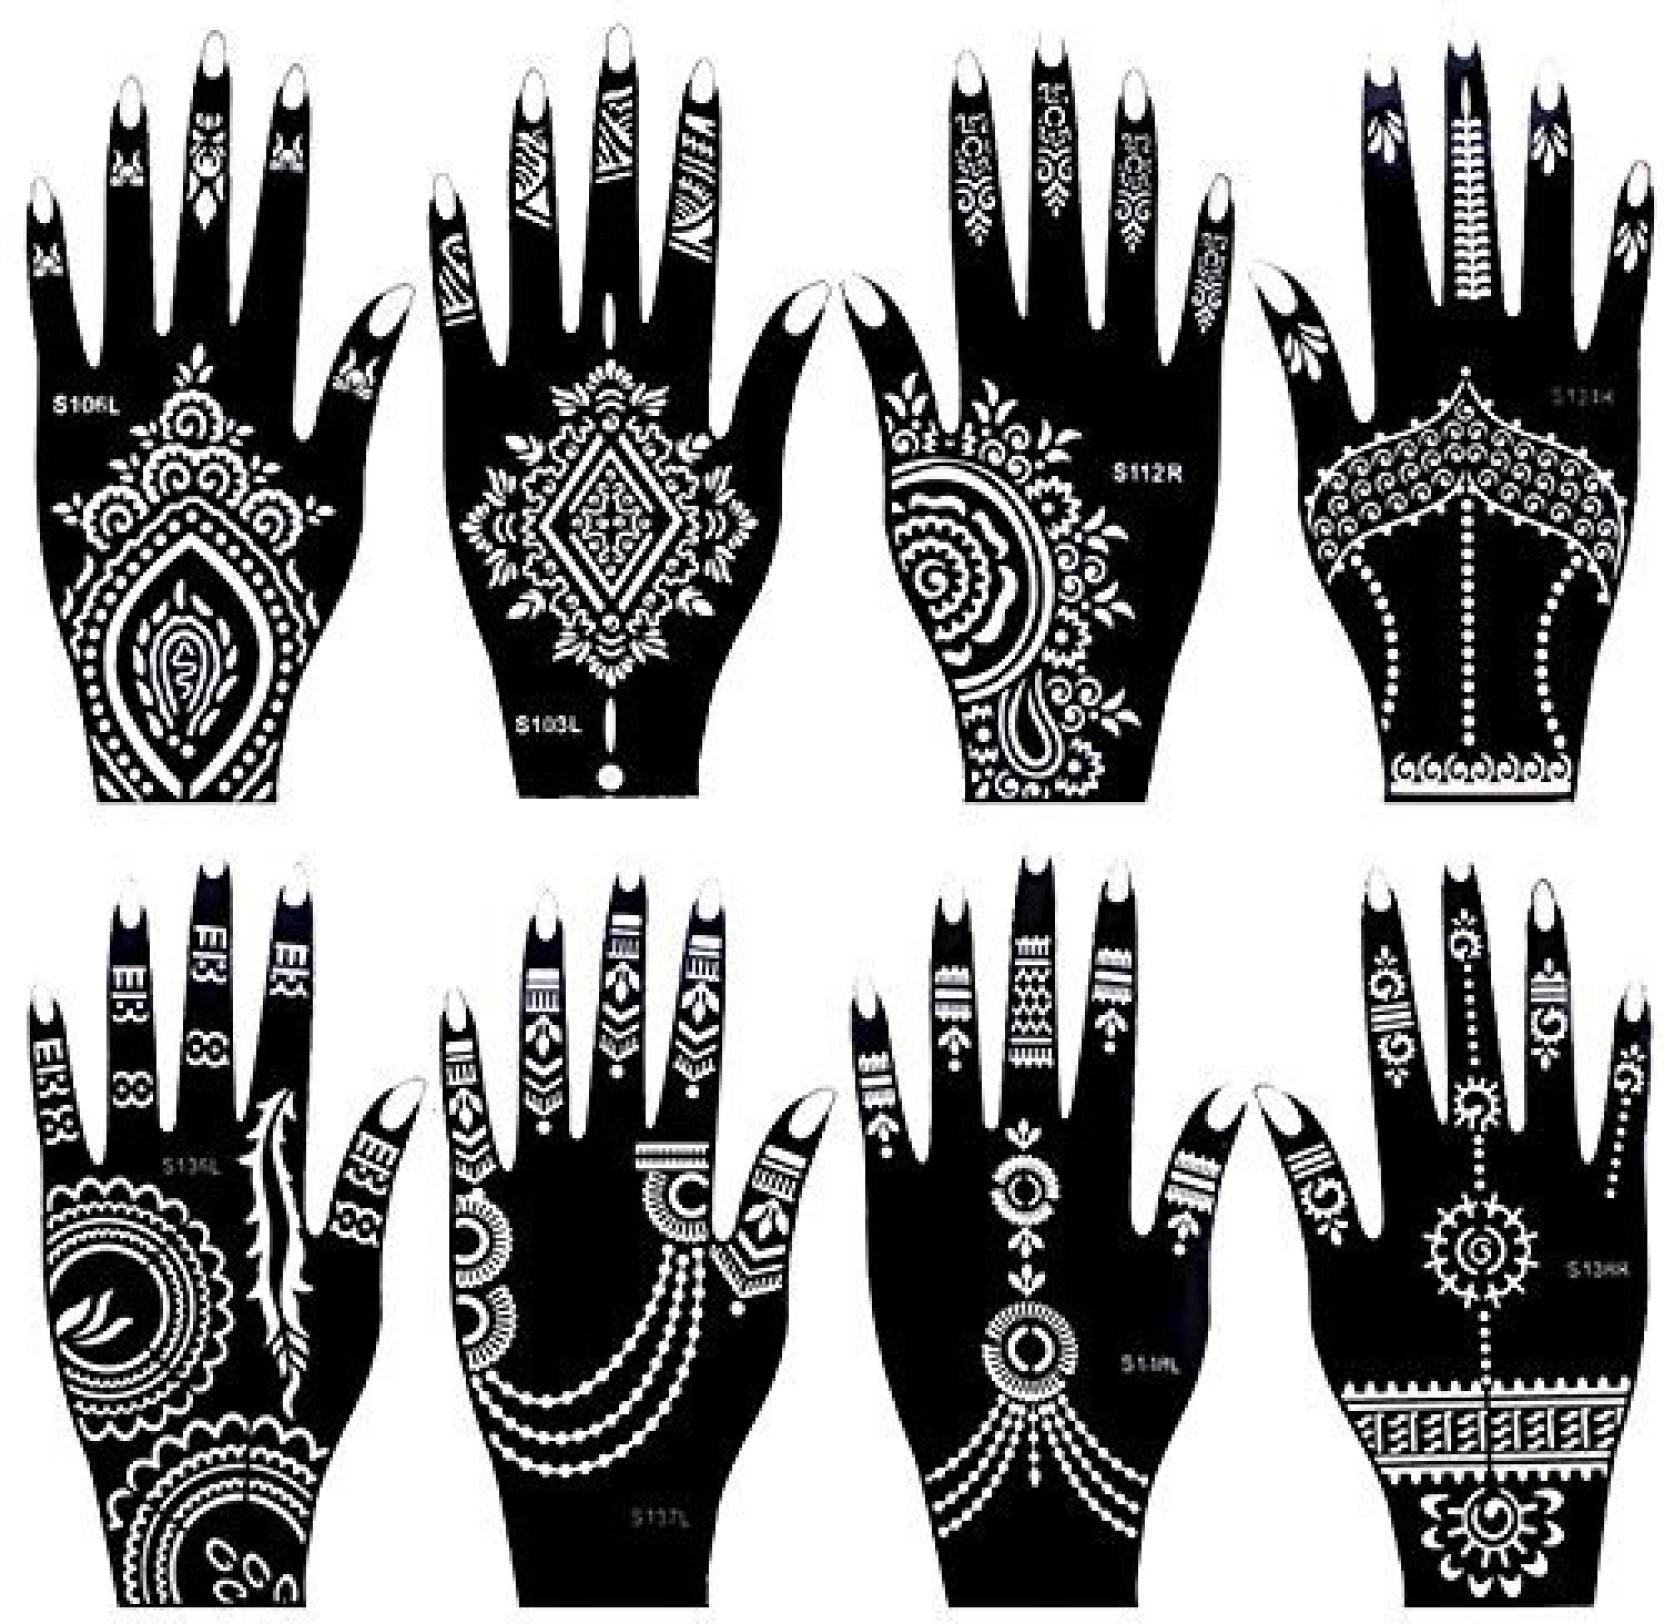 373a77c2e ... Tattoo Stencil Set for Women Girls Hand Finger Body Paint Temporary. ON  OFFER